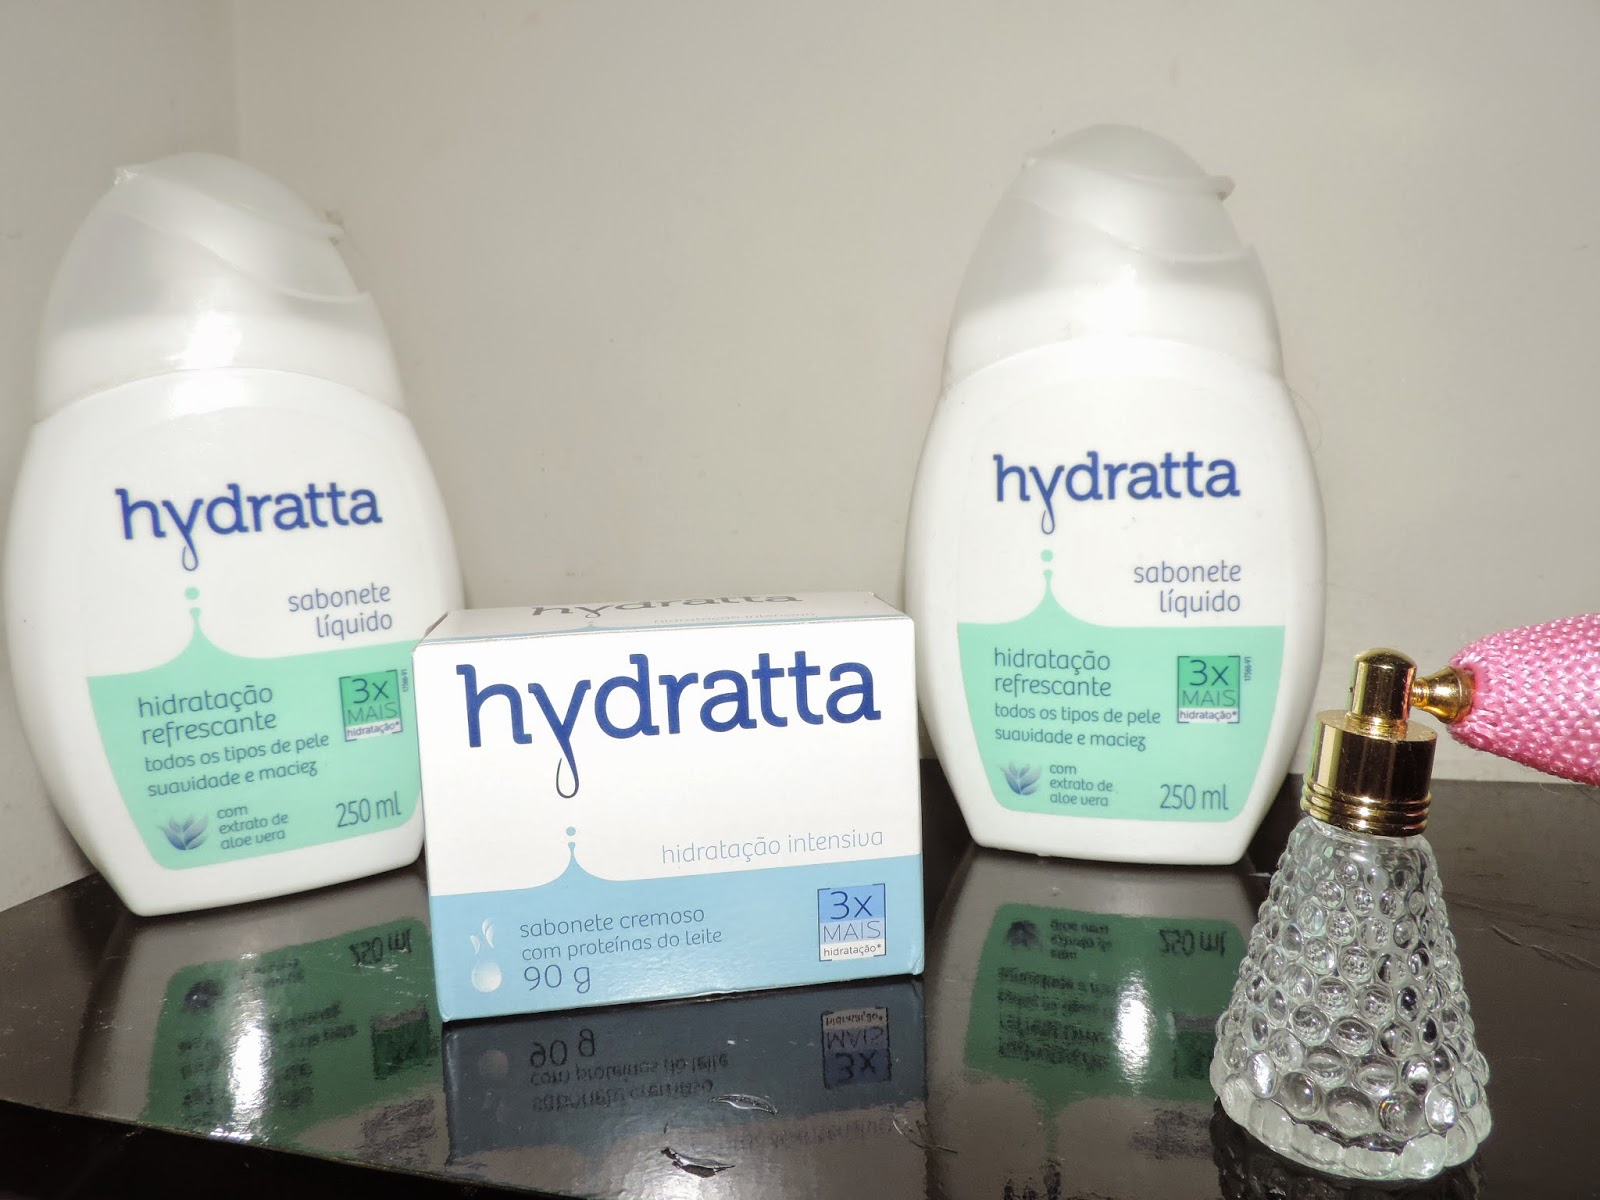 Hydratta